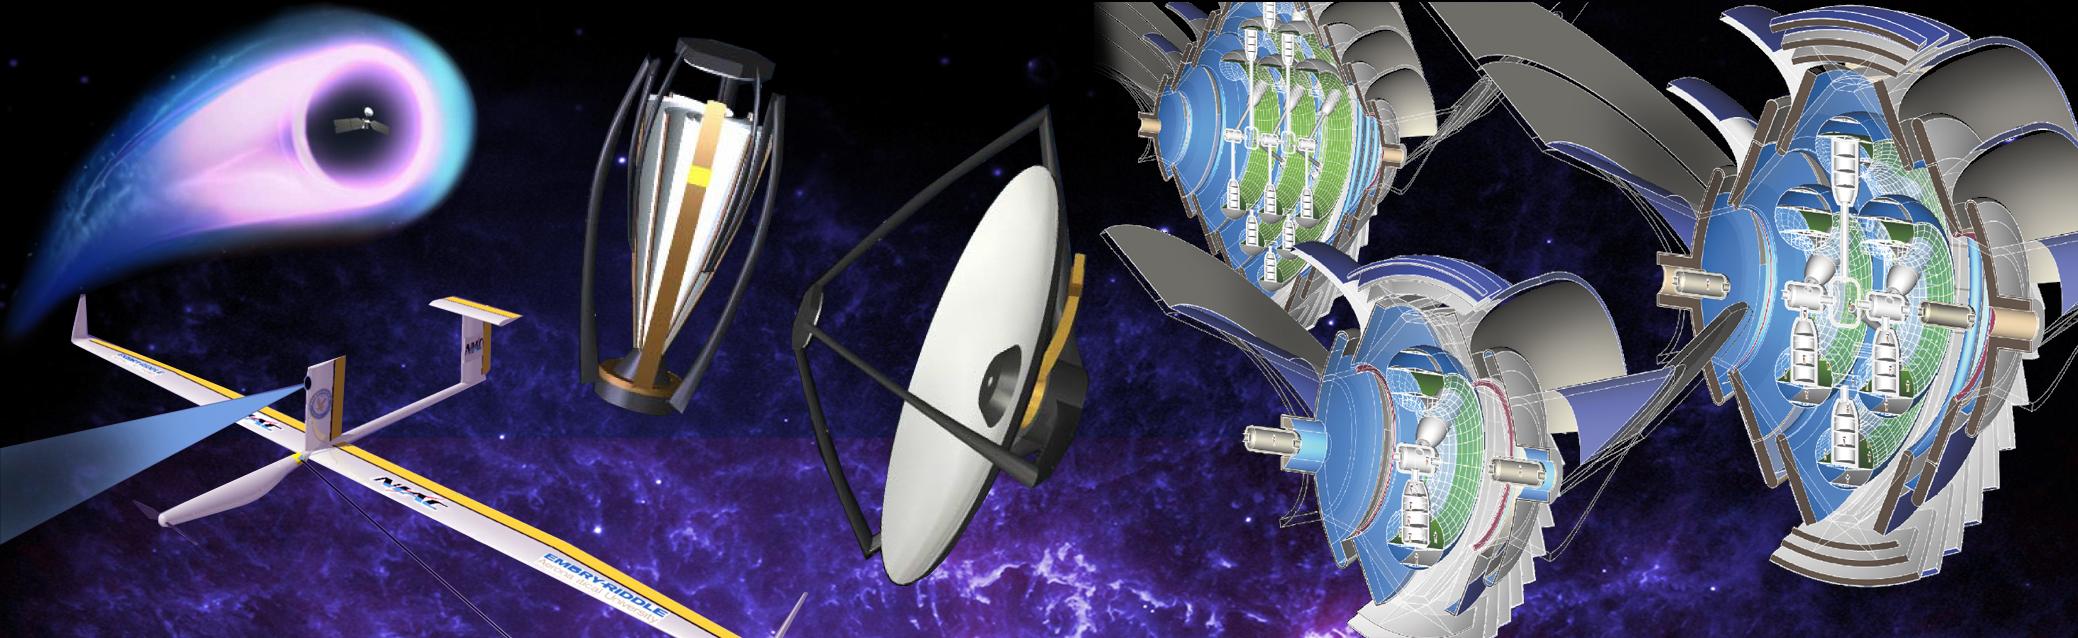 NASA Funds Interstellar Flight System, 7 Other Wild Space Tech Ideas